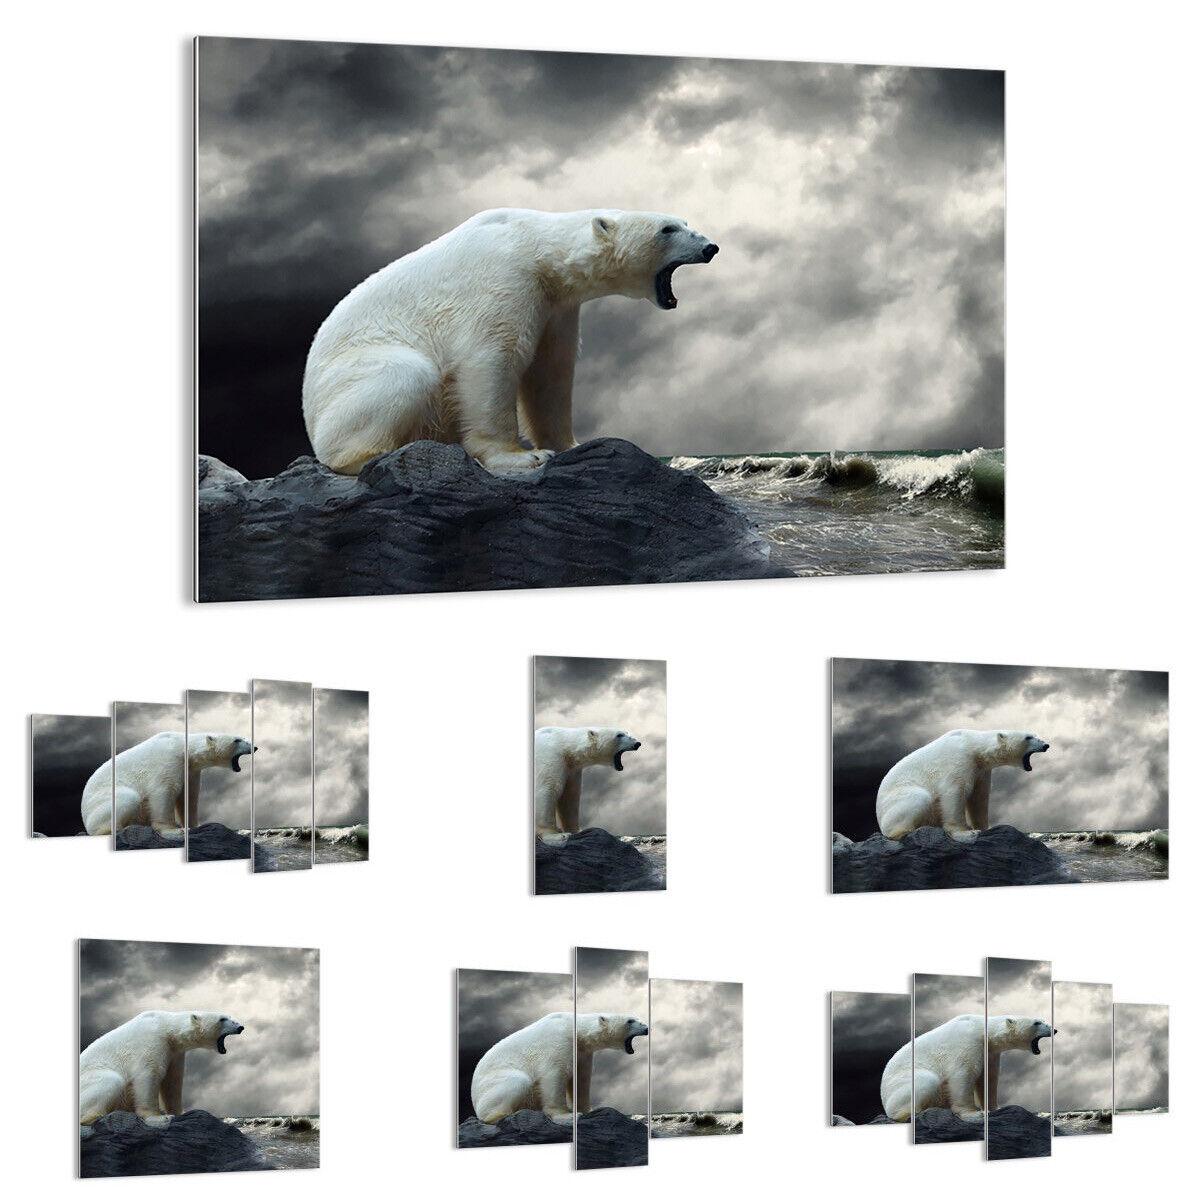 GLASBILD Wandbild Deko Bär Tiere Wasser Eis 2451 DE